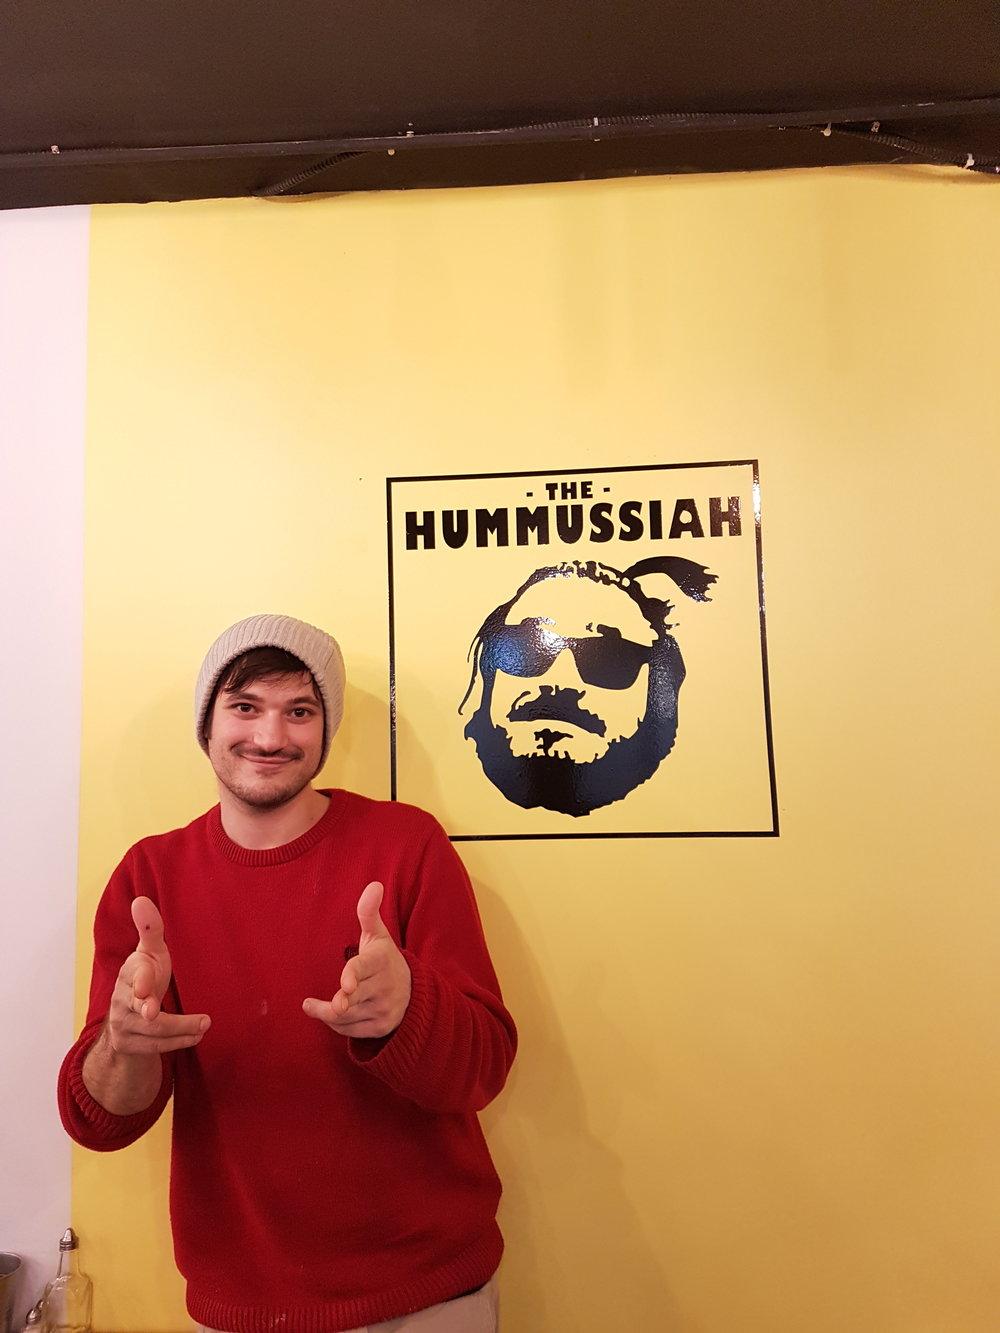 The Hummussiah